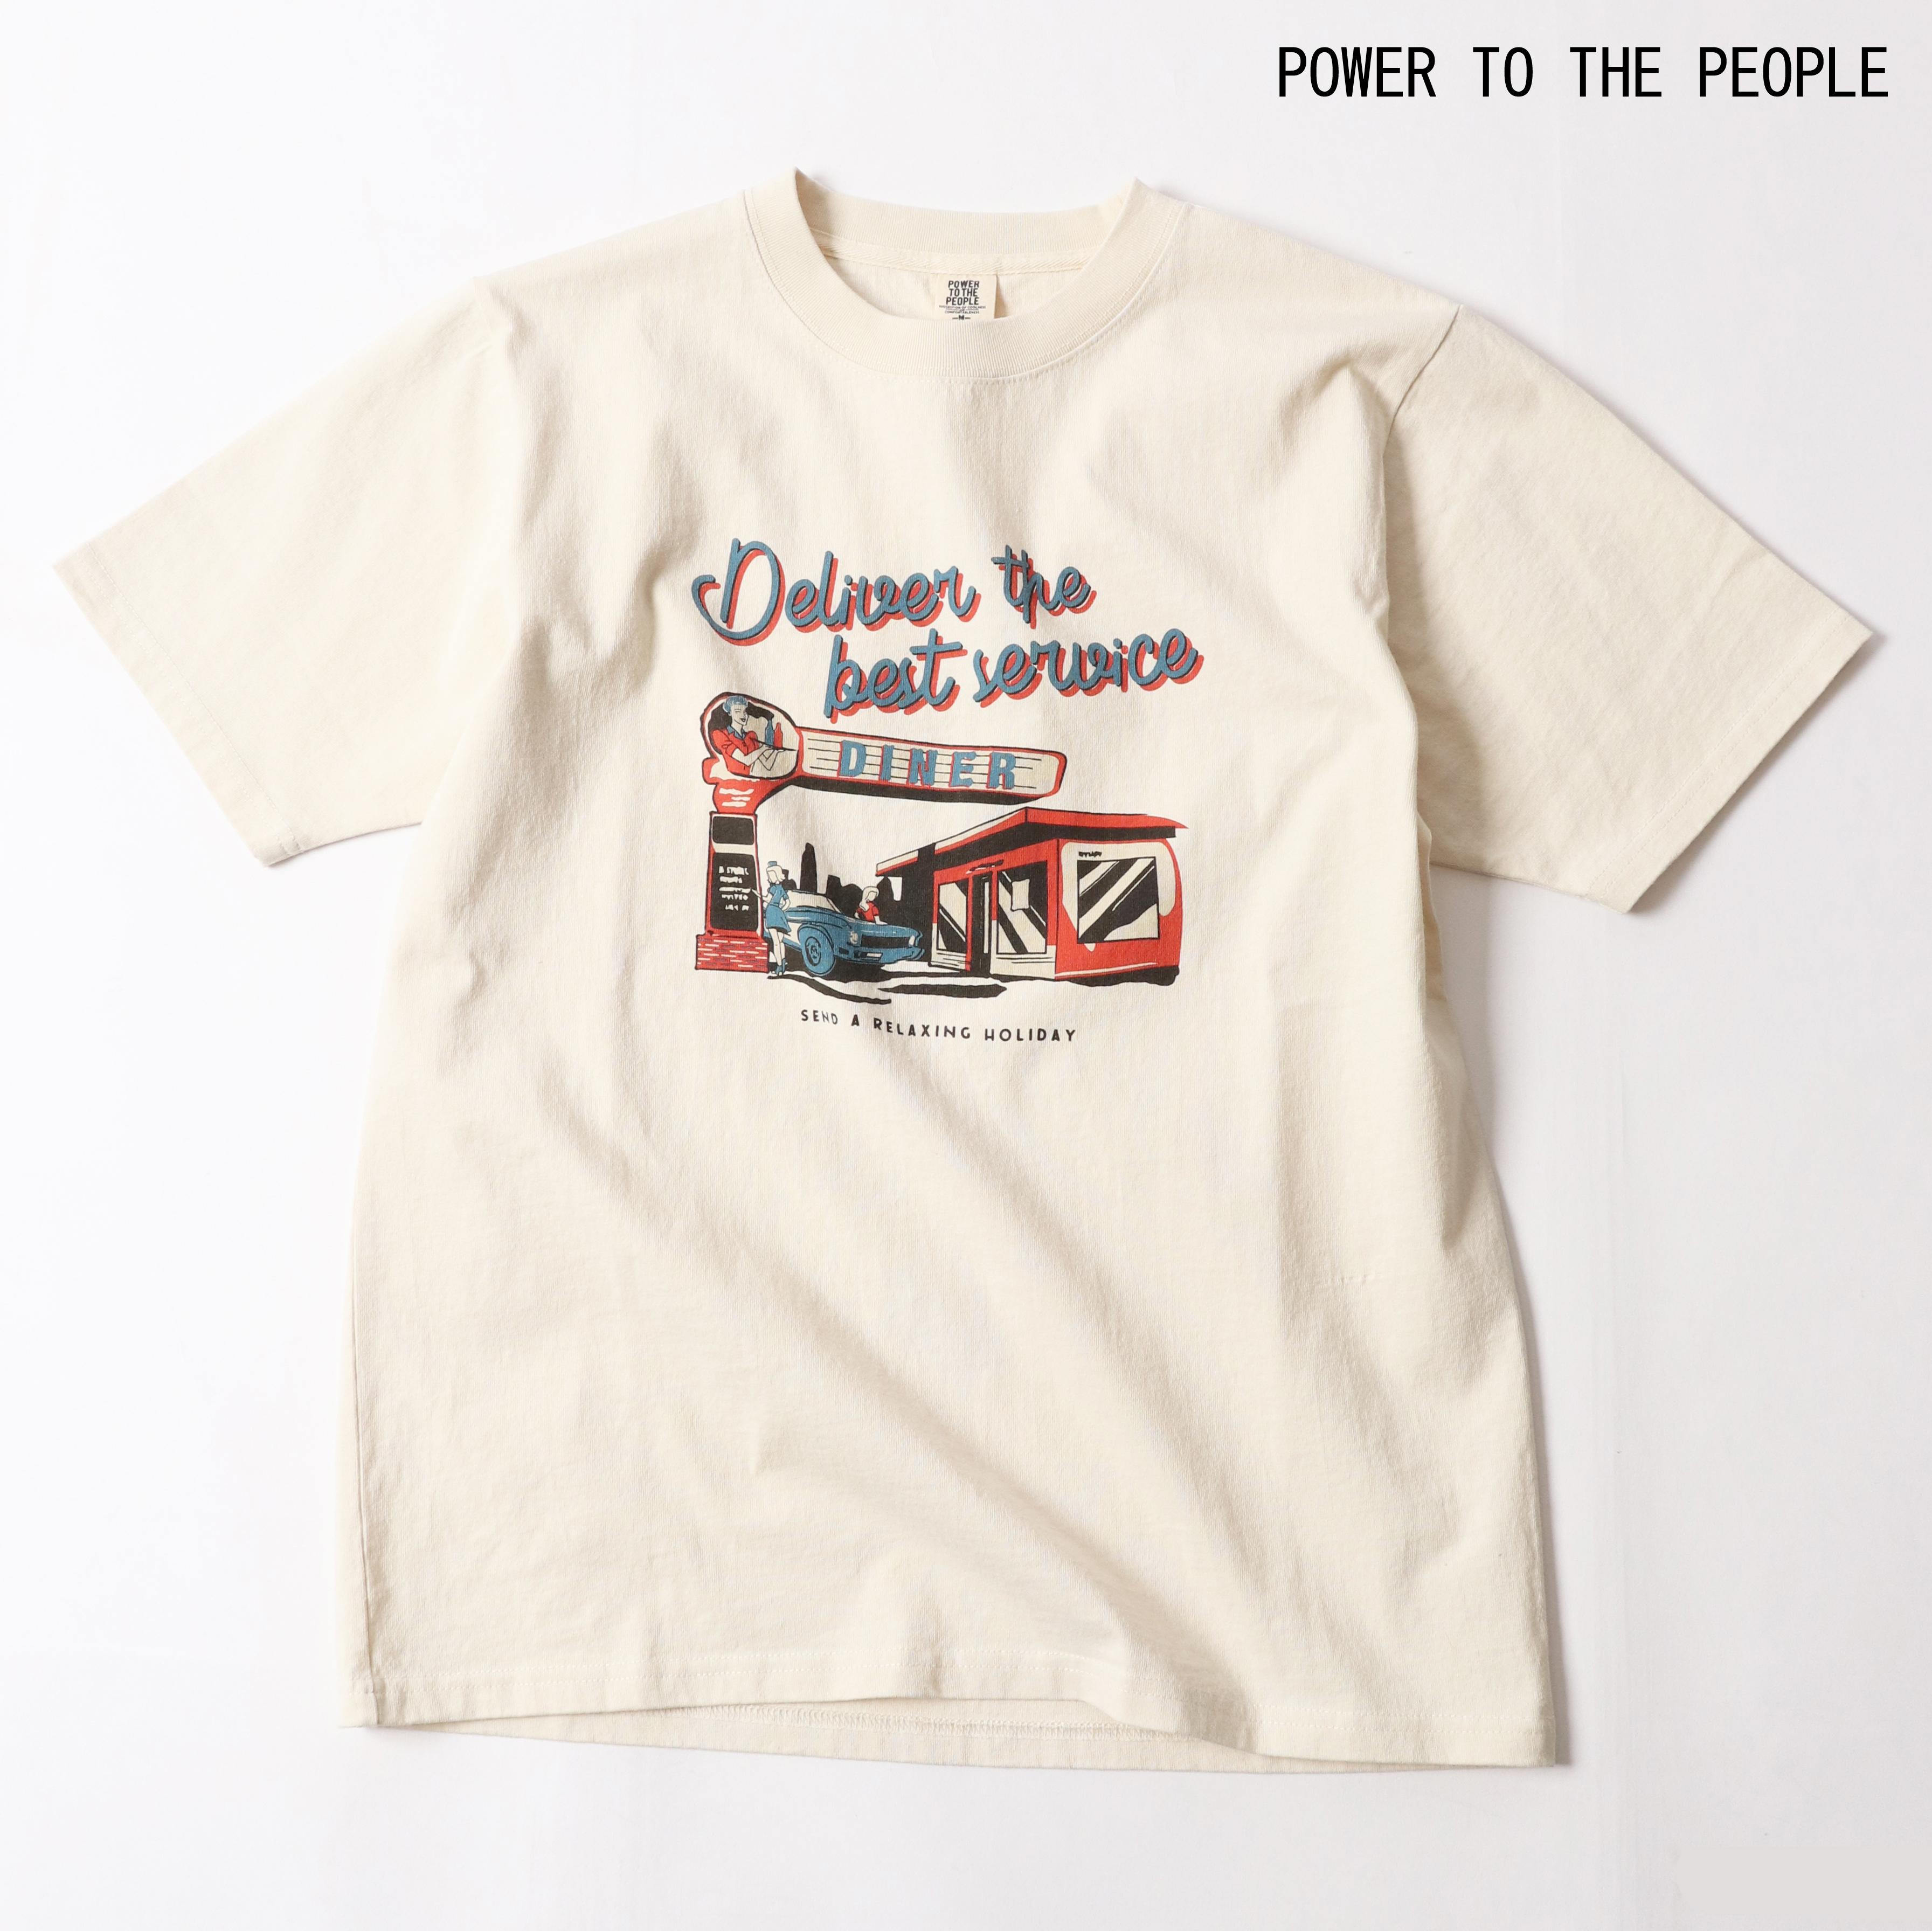 ≪VintageWash加工≫ 古着風イラストTシャツ NO0512146